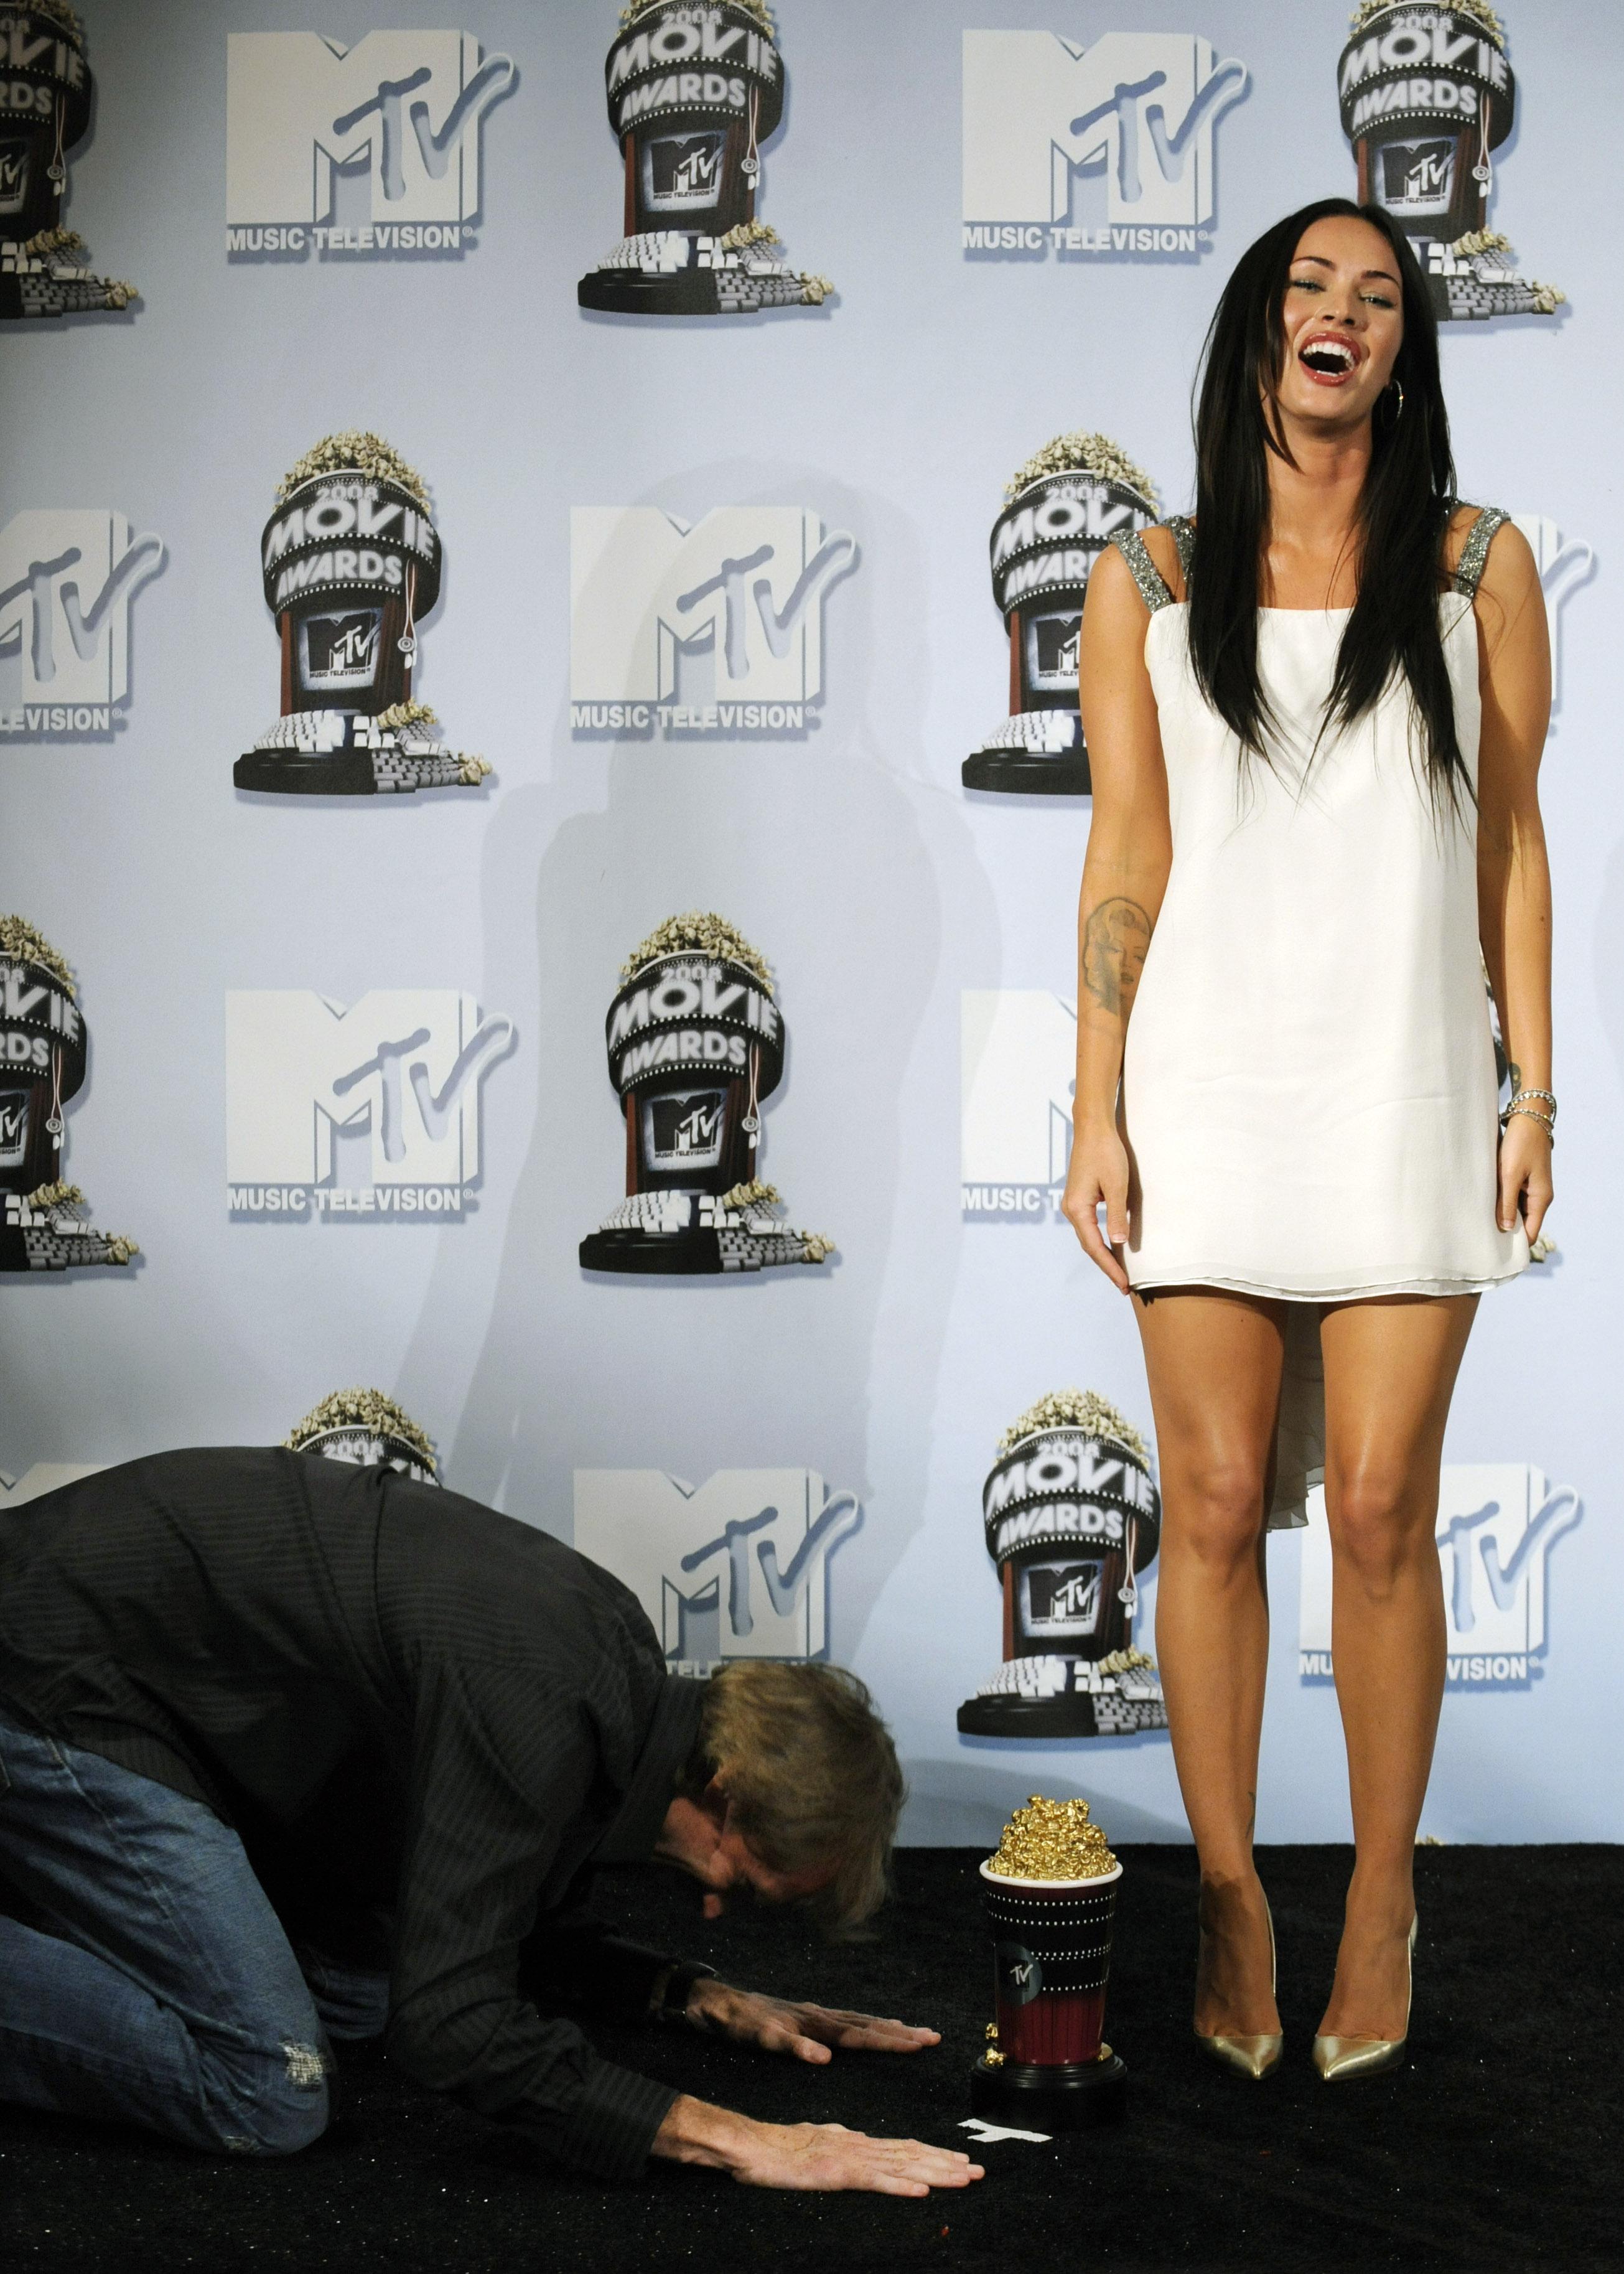 Megan_Fox___MTV_Movie_Awards_backstage__CU_ISA_010608_04_122_539lo.jpg